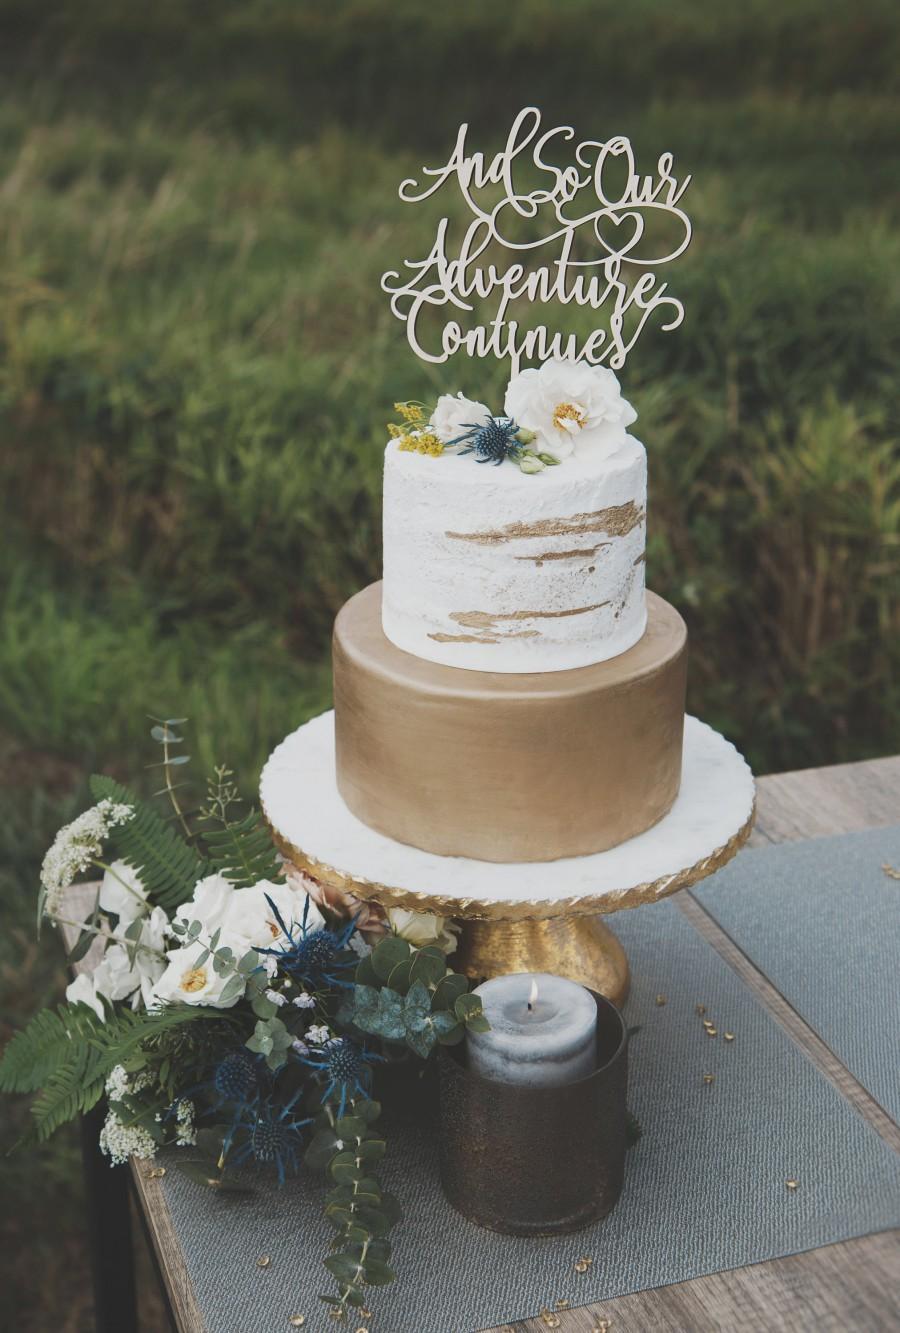 زفاف - Adventure Continues Wedding Cake Topper, Adventure Begins, Wedding Cake Topper, Wedding Decor, Wedding Cake Toppers, Cake Topper Wedding